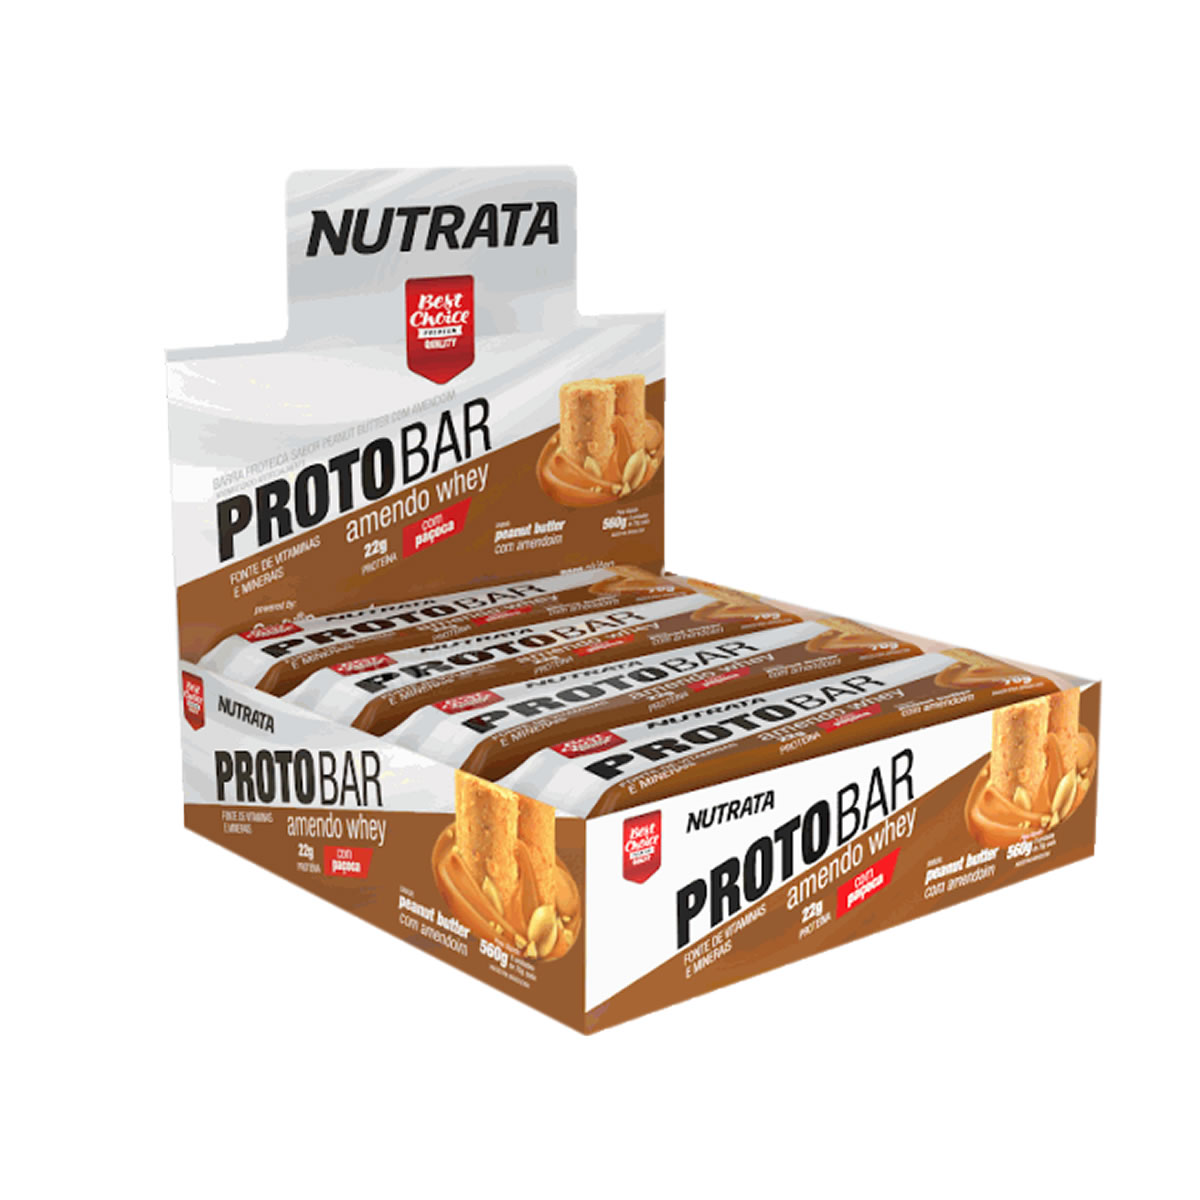 Barra de Proteína sabor Amendo Whey Display com 8 un de 70g - Nutrata